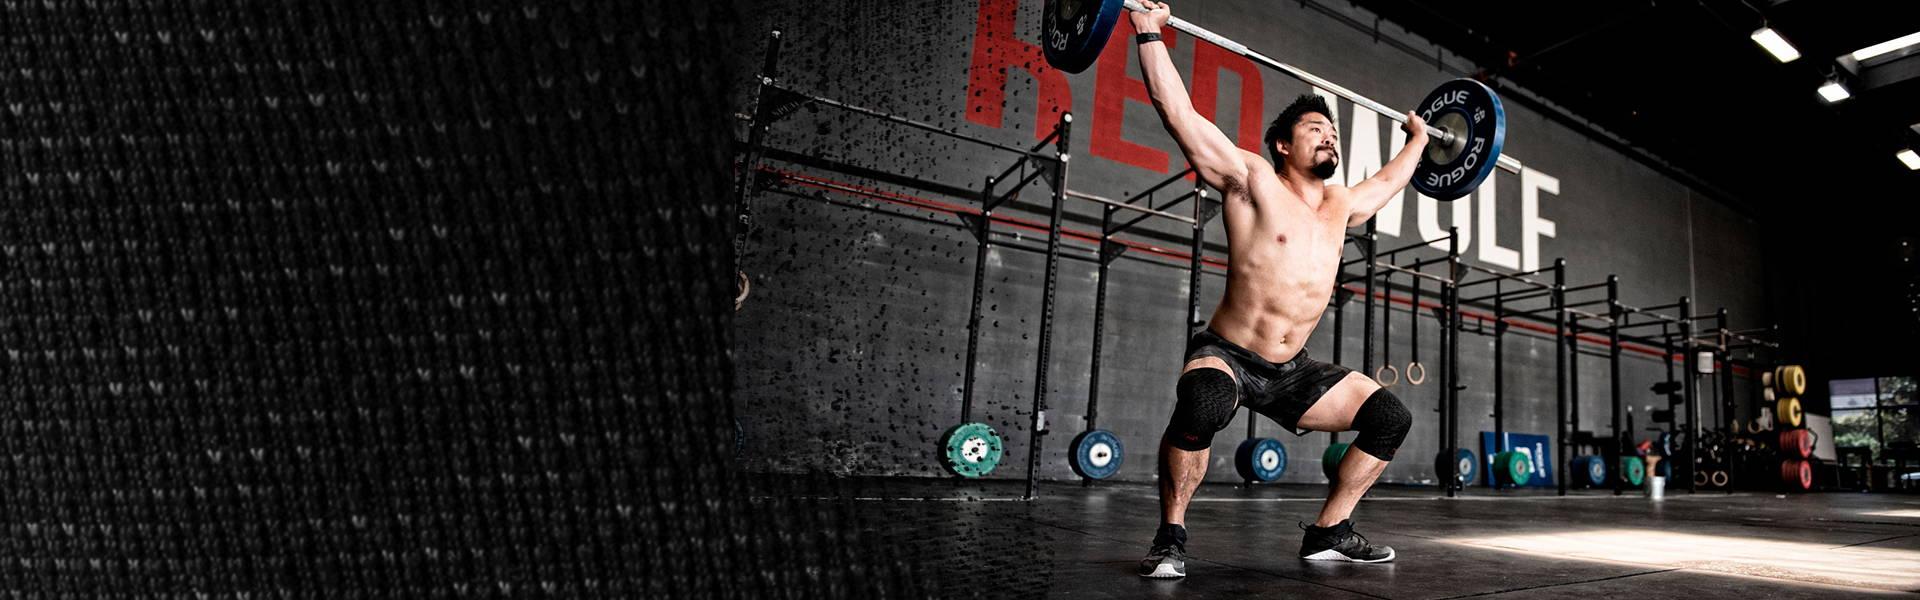 d257e97cf50 Sports Medicine, Protective Gear & Recovery Items - McDavid USA